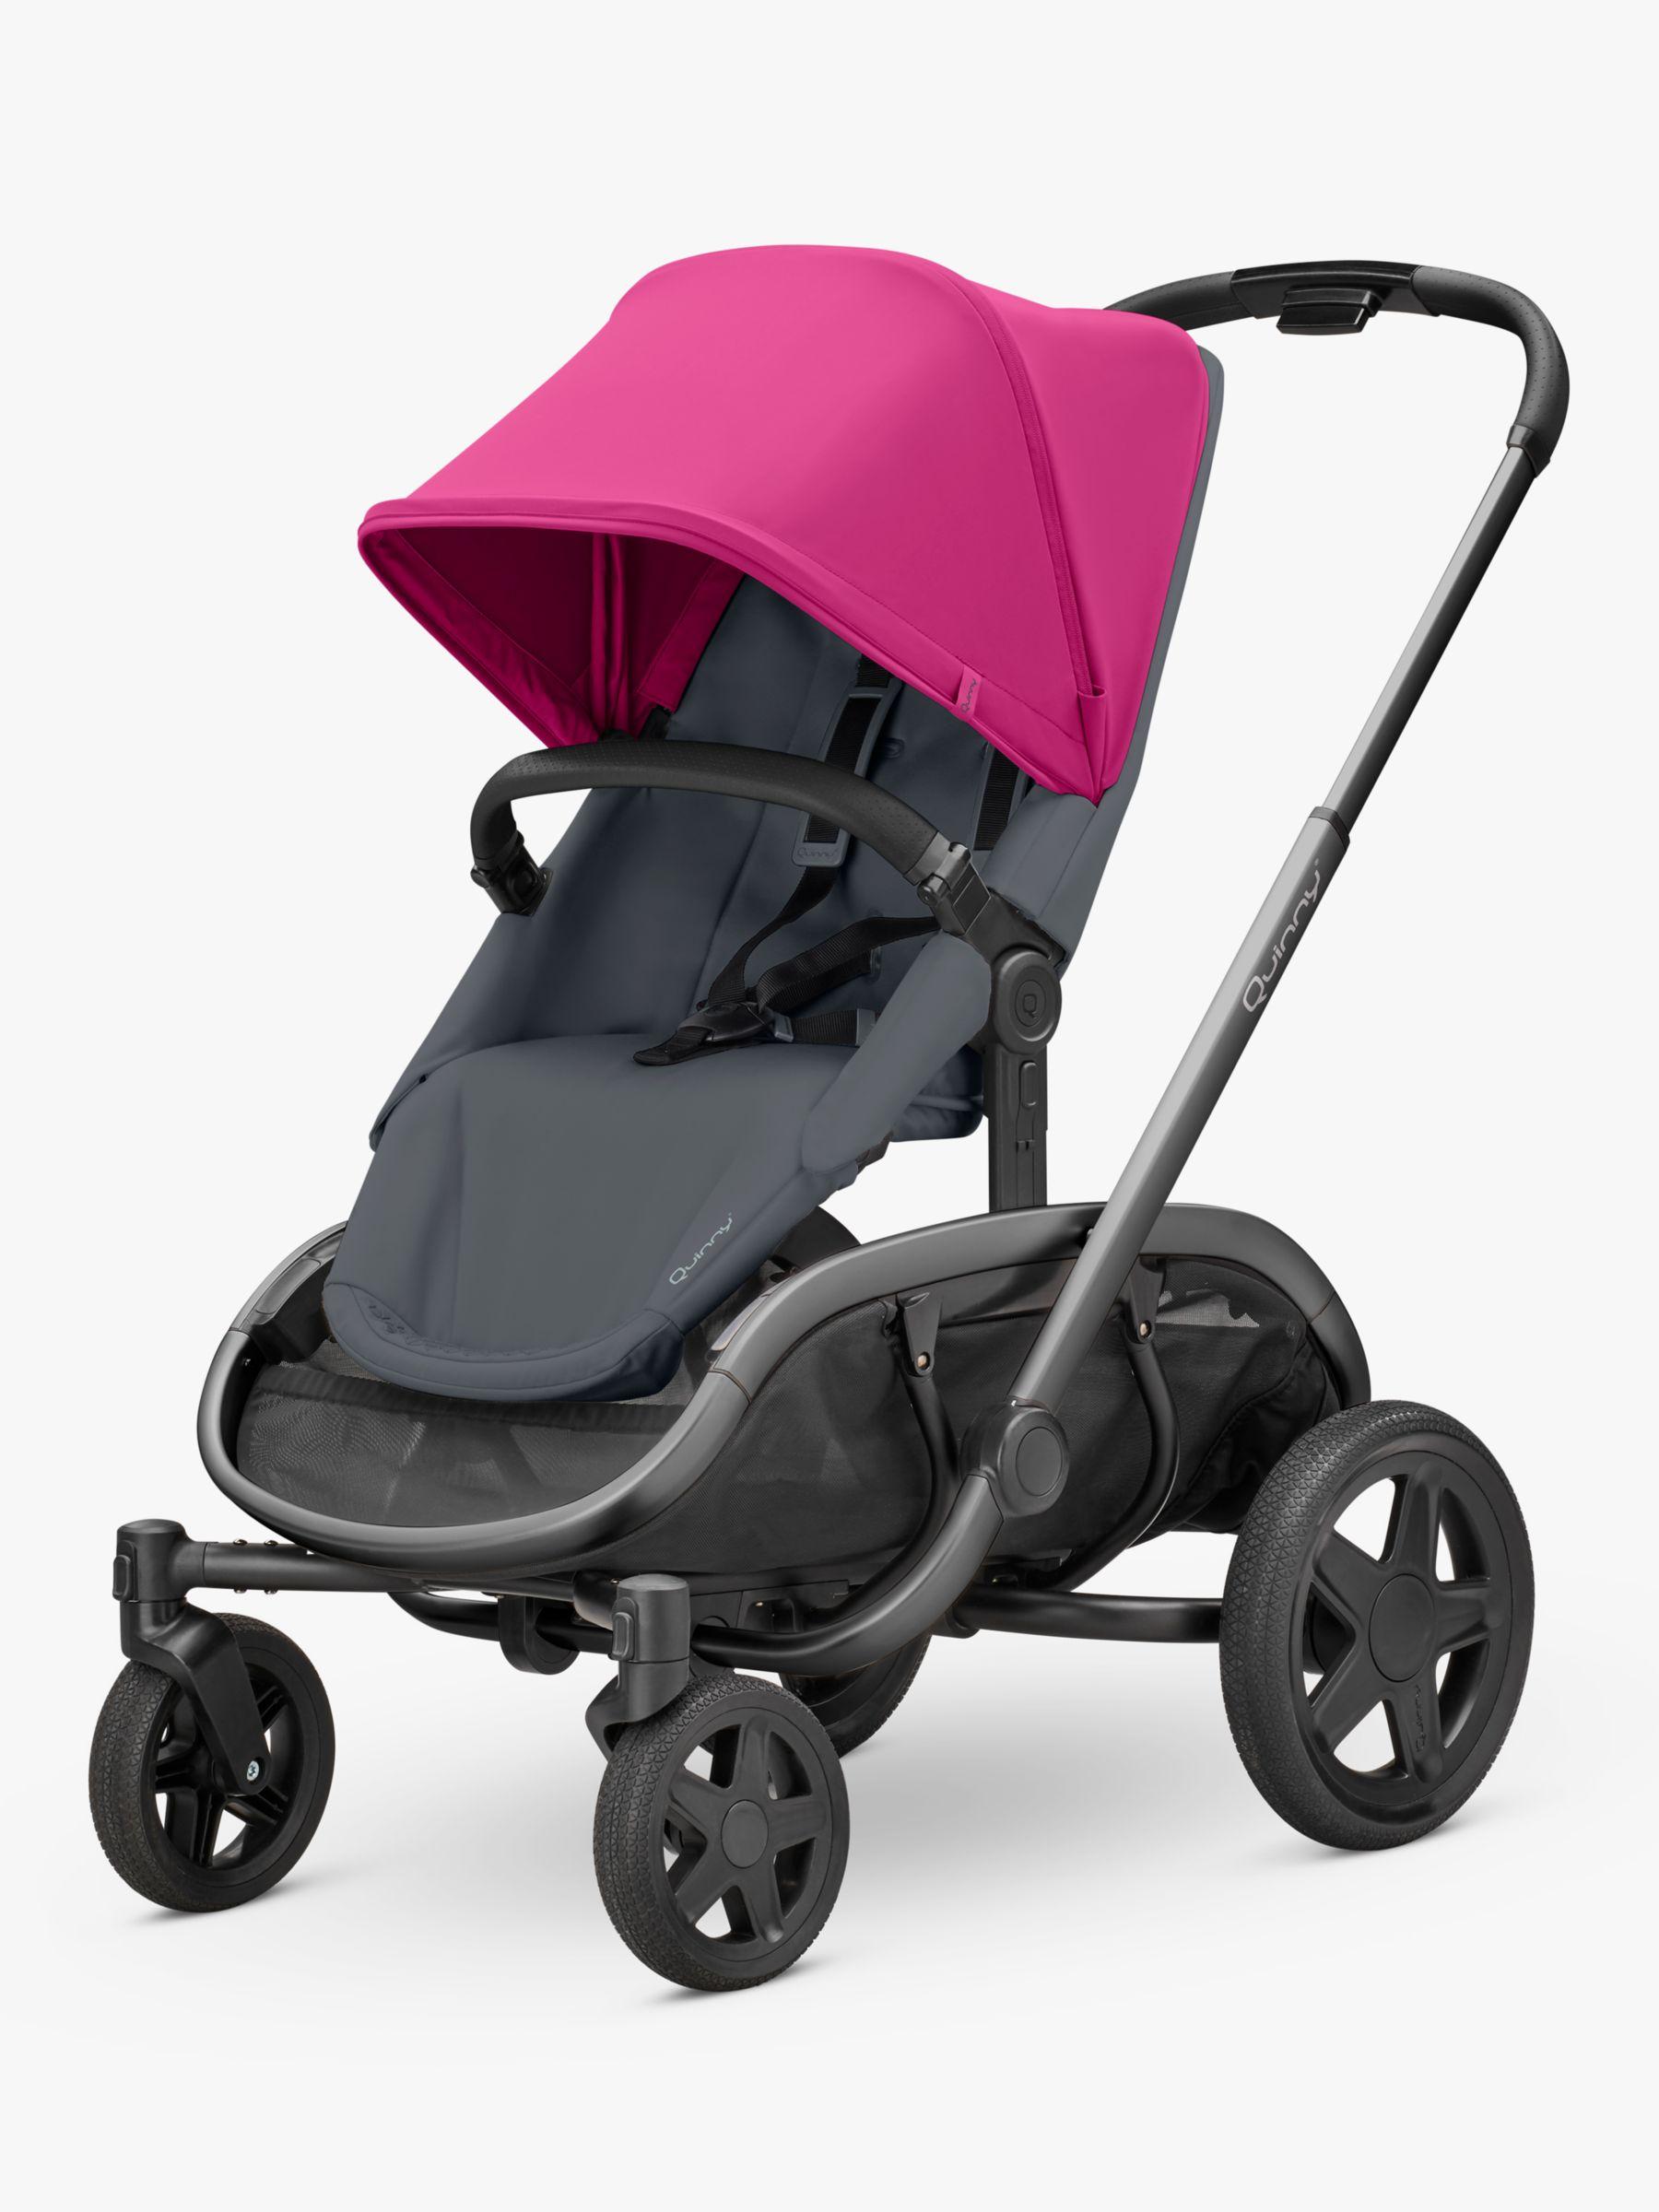 Quinny Quinny Hubb Mono Pushchair, Pink/Graphite